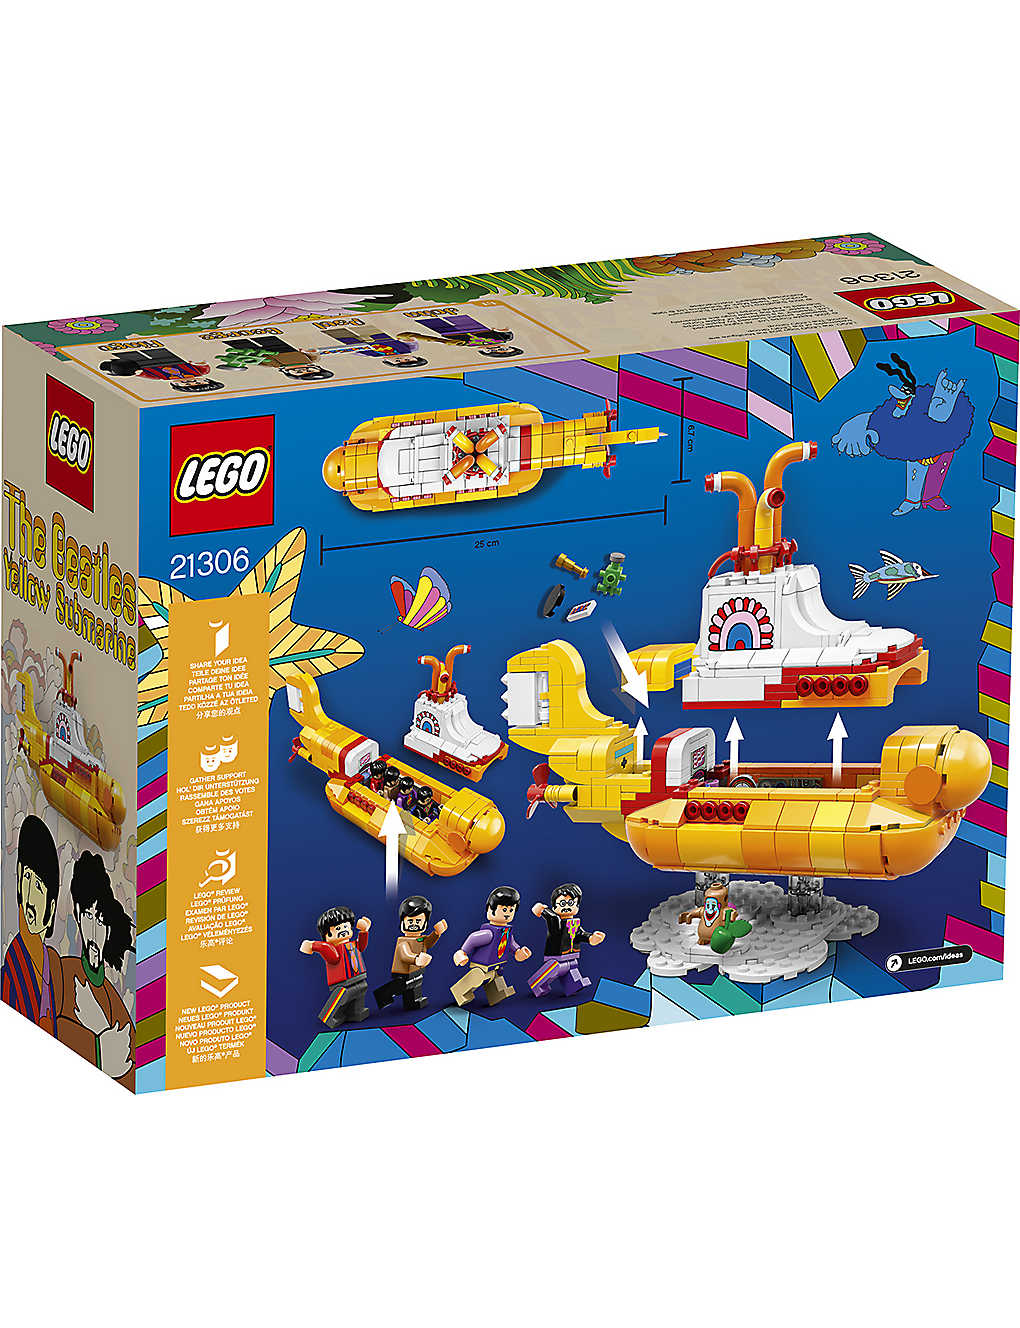 The new Beatles Yellow Submarine LEGO